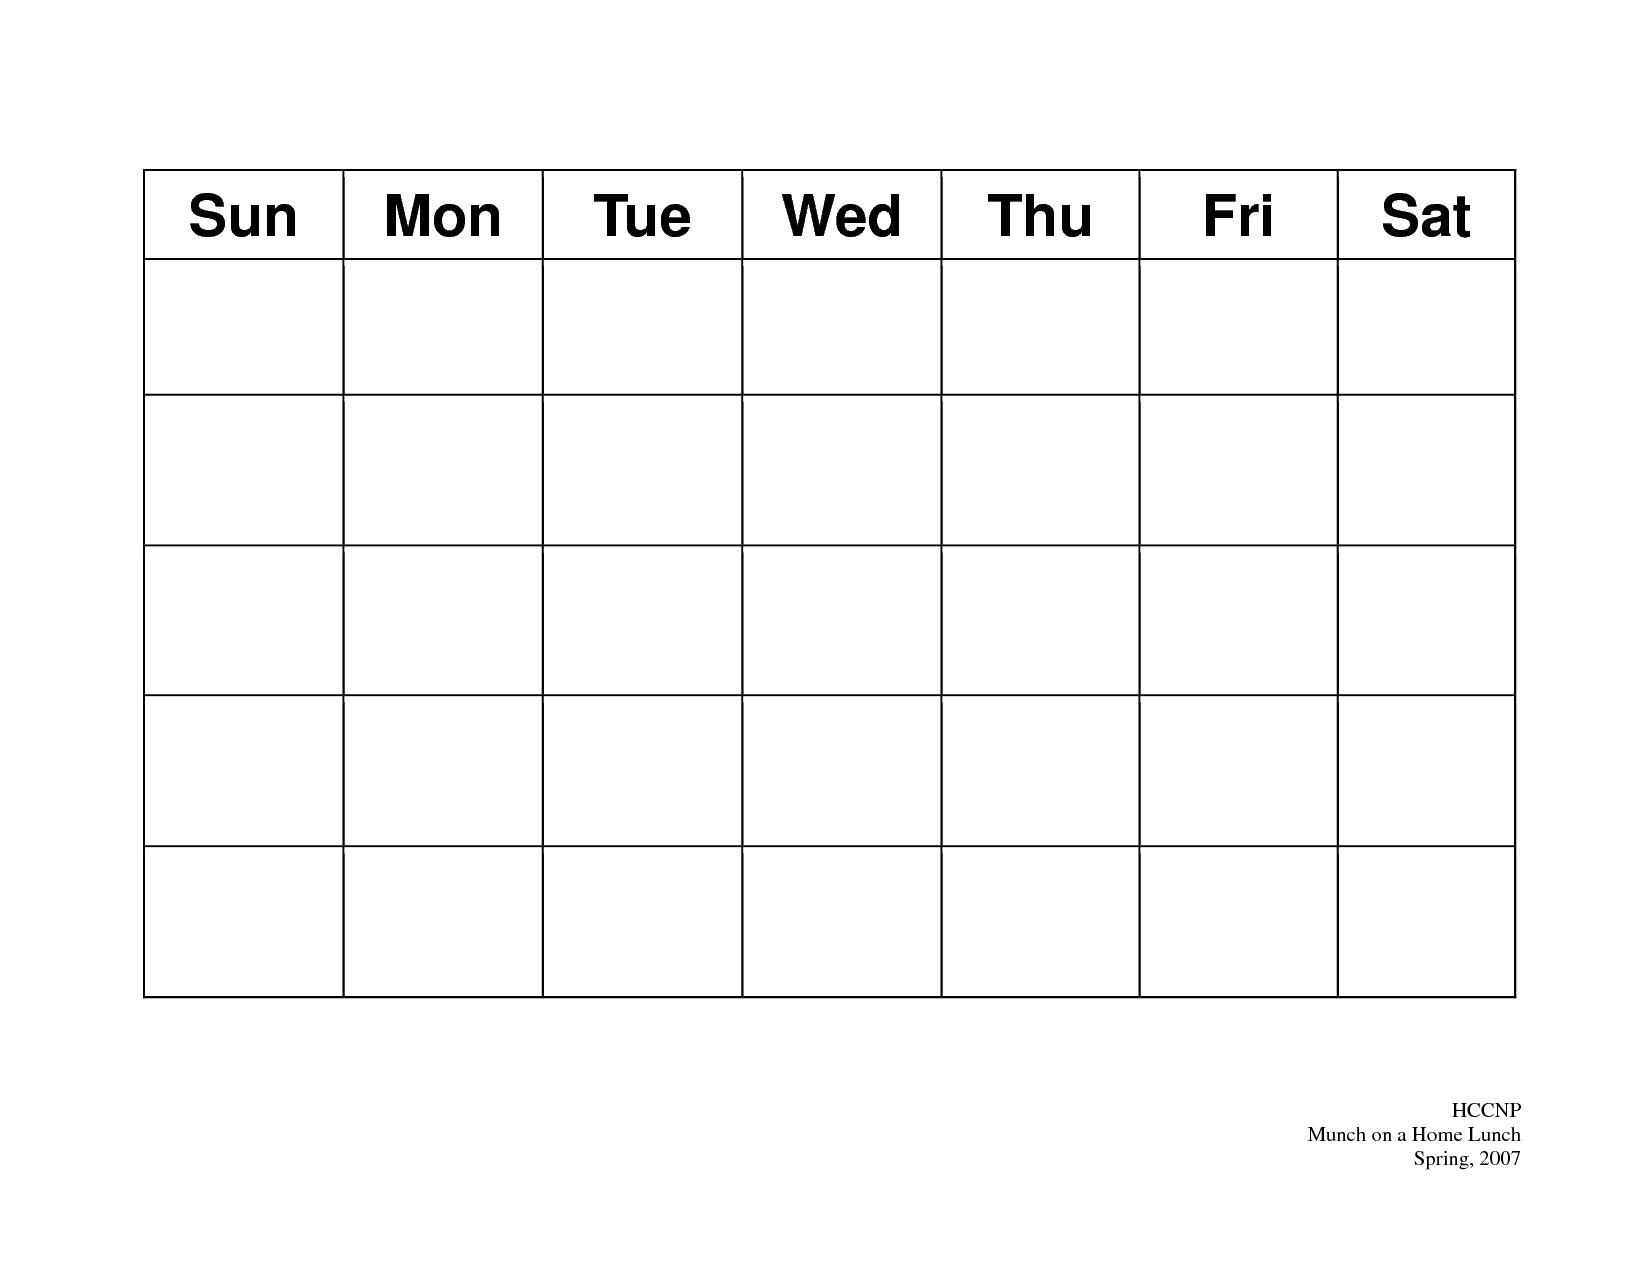 31 Day Blank Calendar Template | Ten Wall Calendar-Blank Blank 31 Day Calendar Where You Can